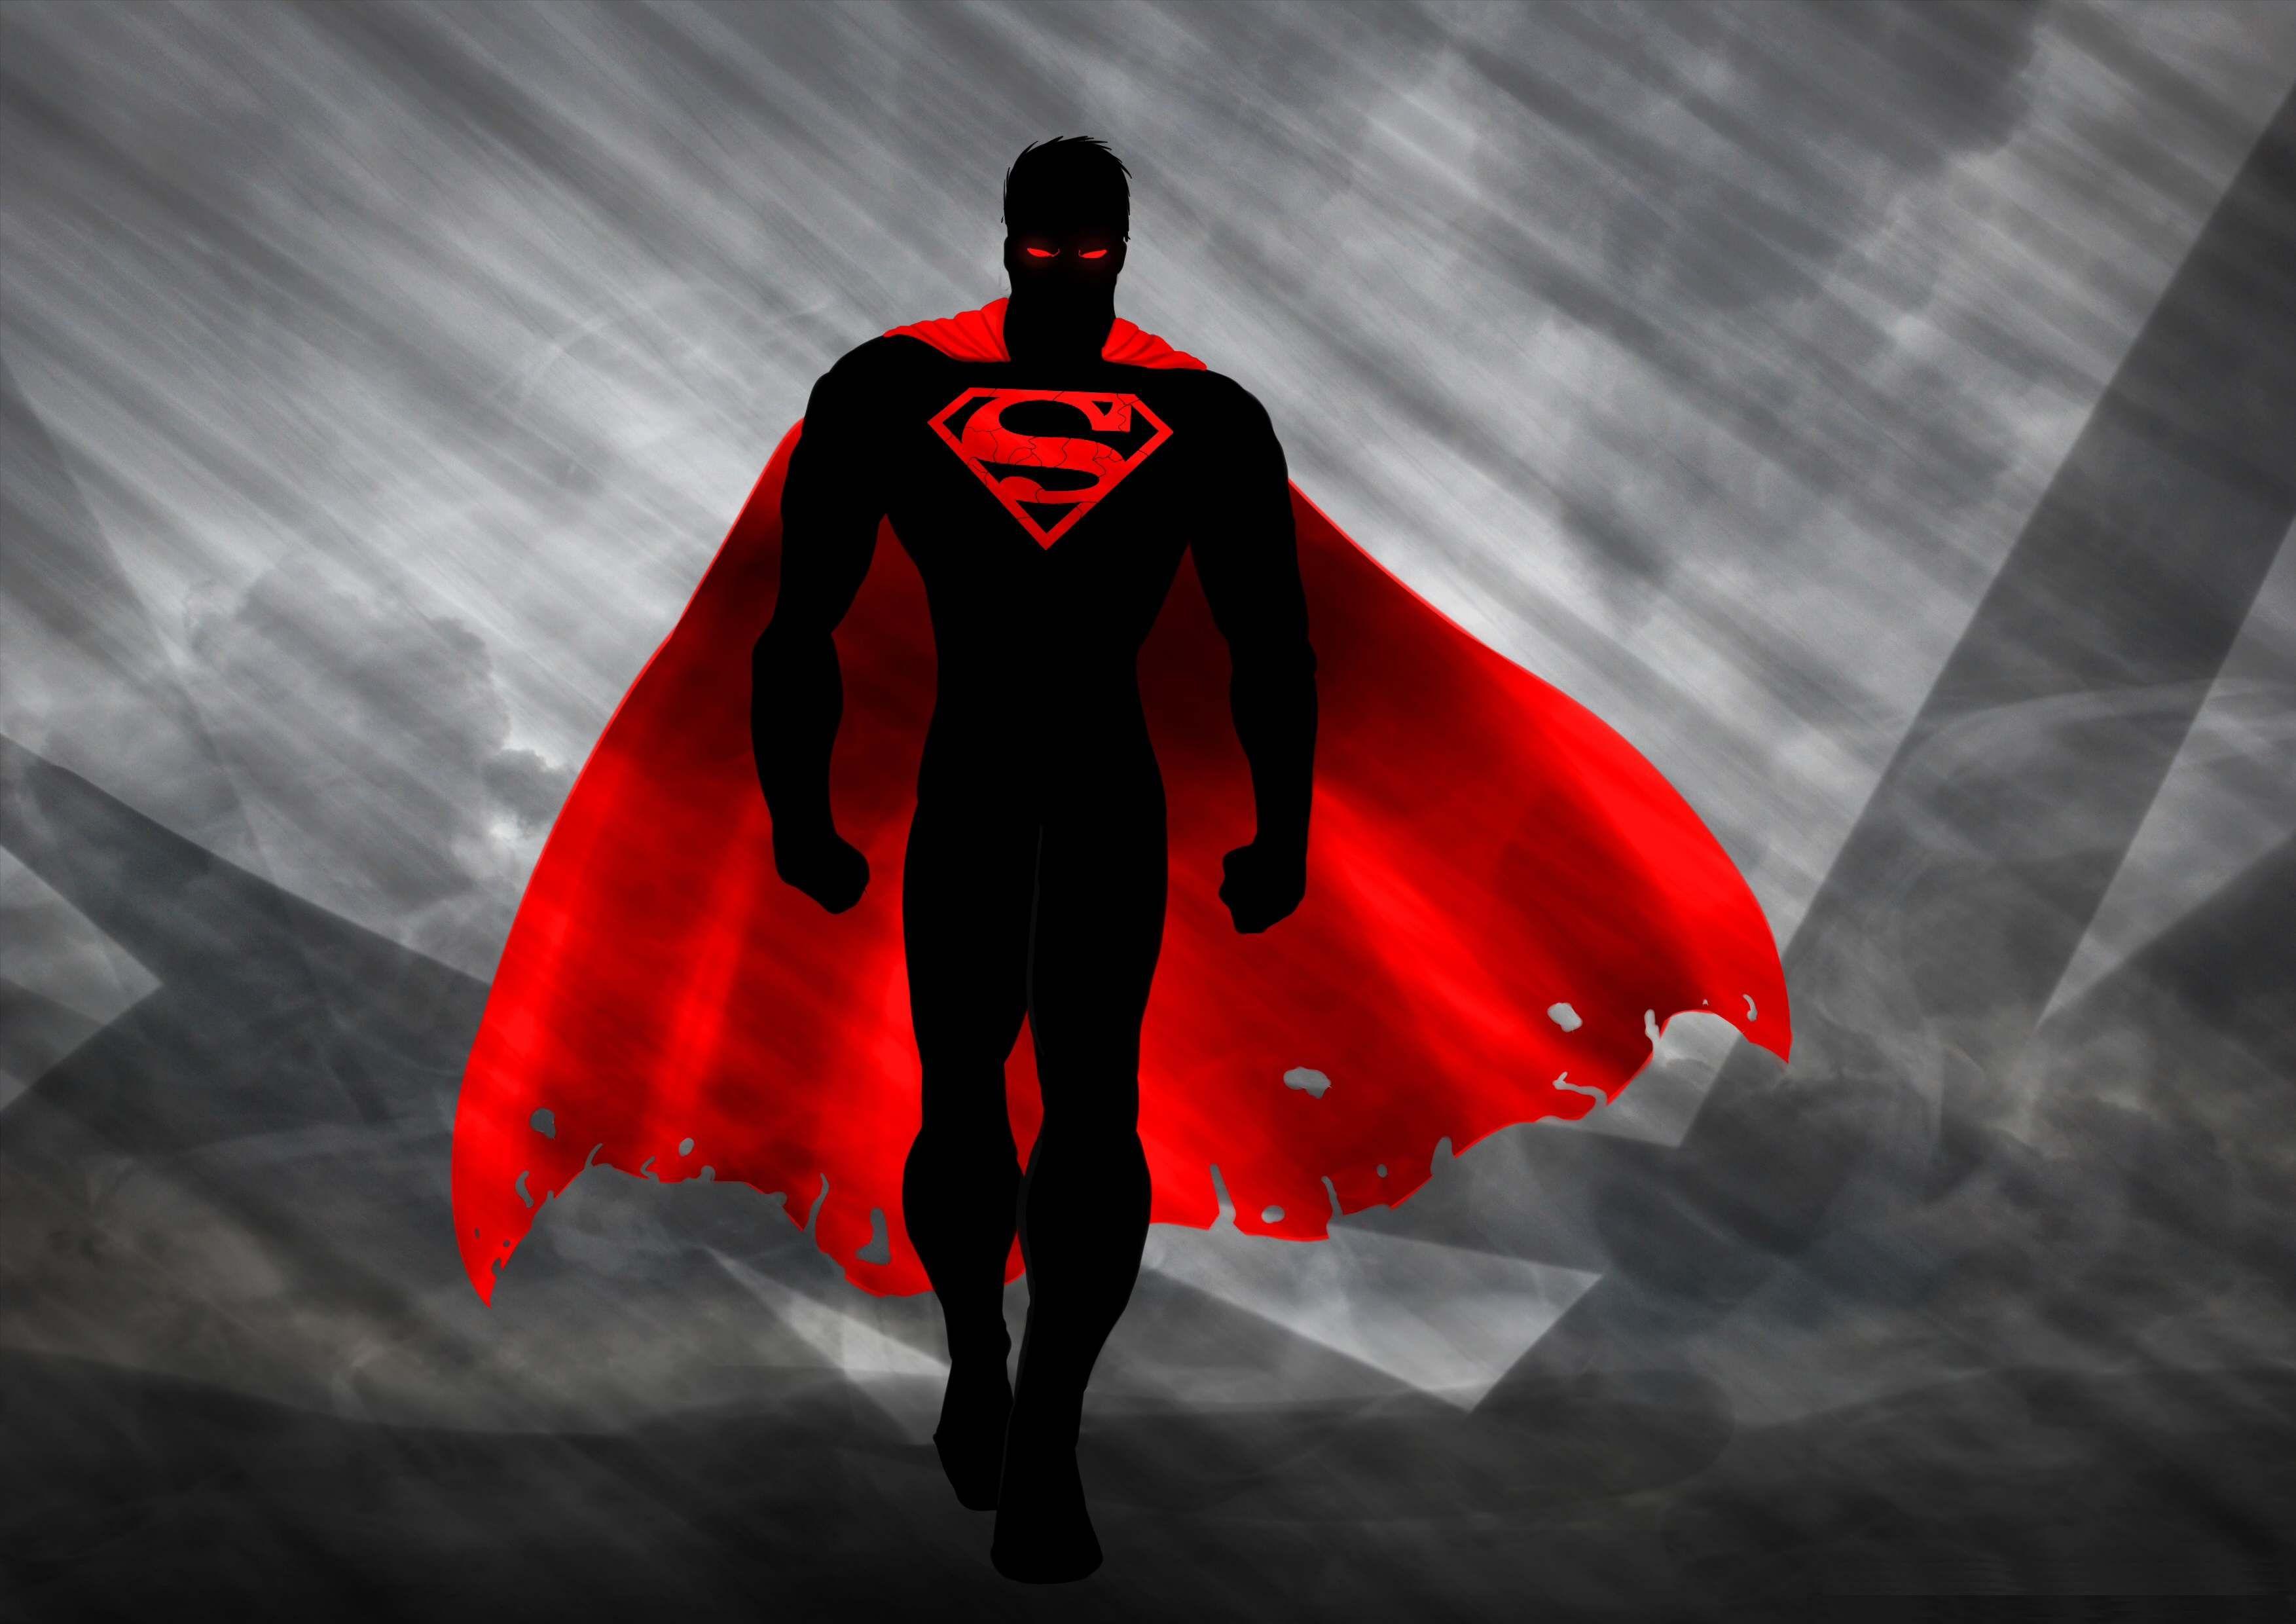 Superhero Wallpaper Hd Wallpapers Backgrounds Images Art Photos Superhero Superman Wallpaper Superman Art